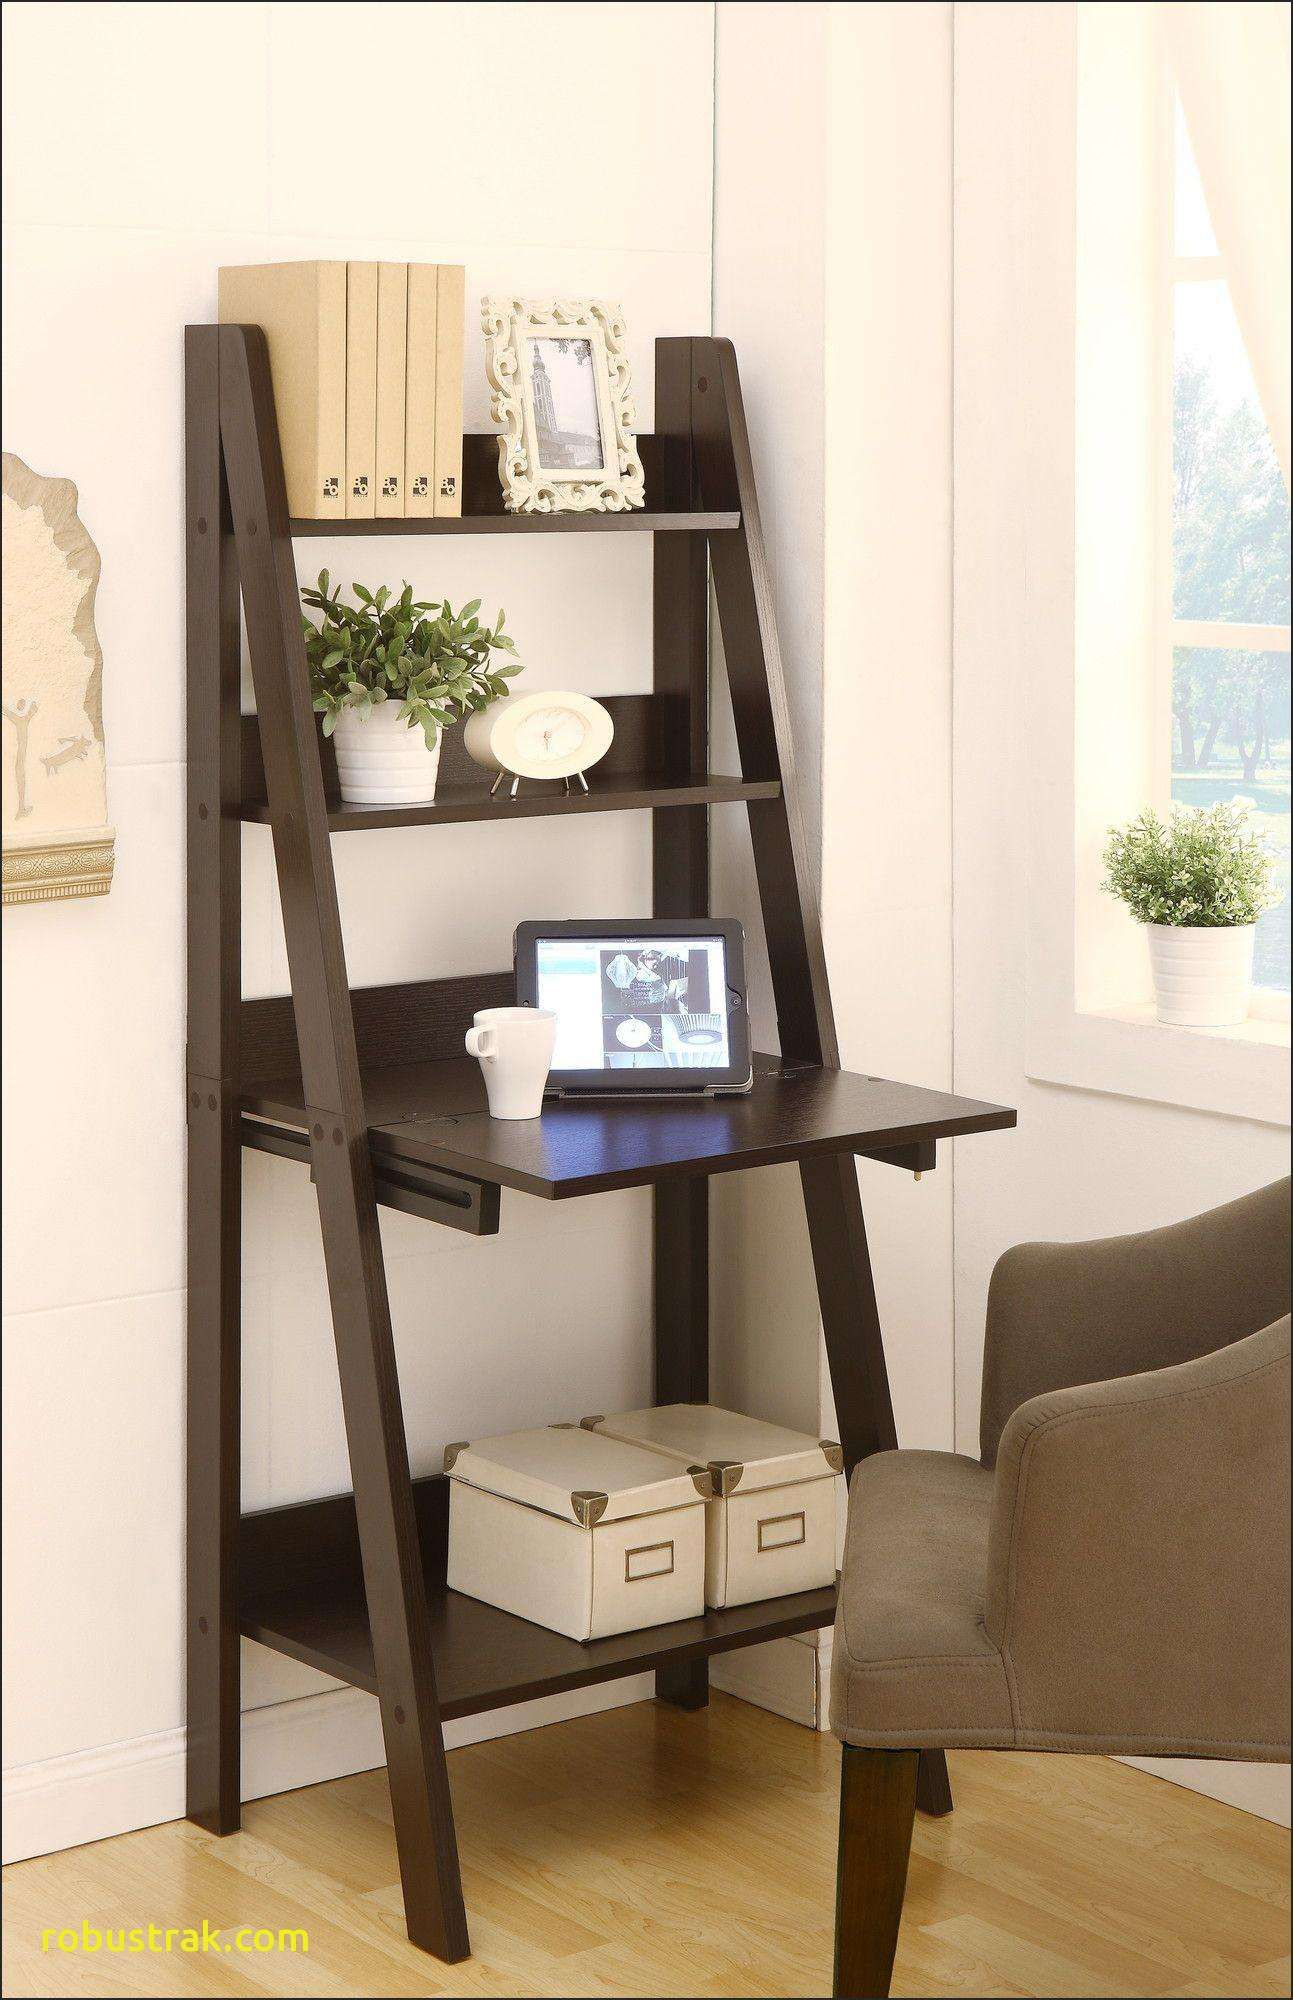 Classy Computer Tables To Go With Living Room Decor: Furniture Marvelous Bookshelf Desk Elegant Stanton Ladder